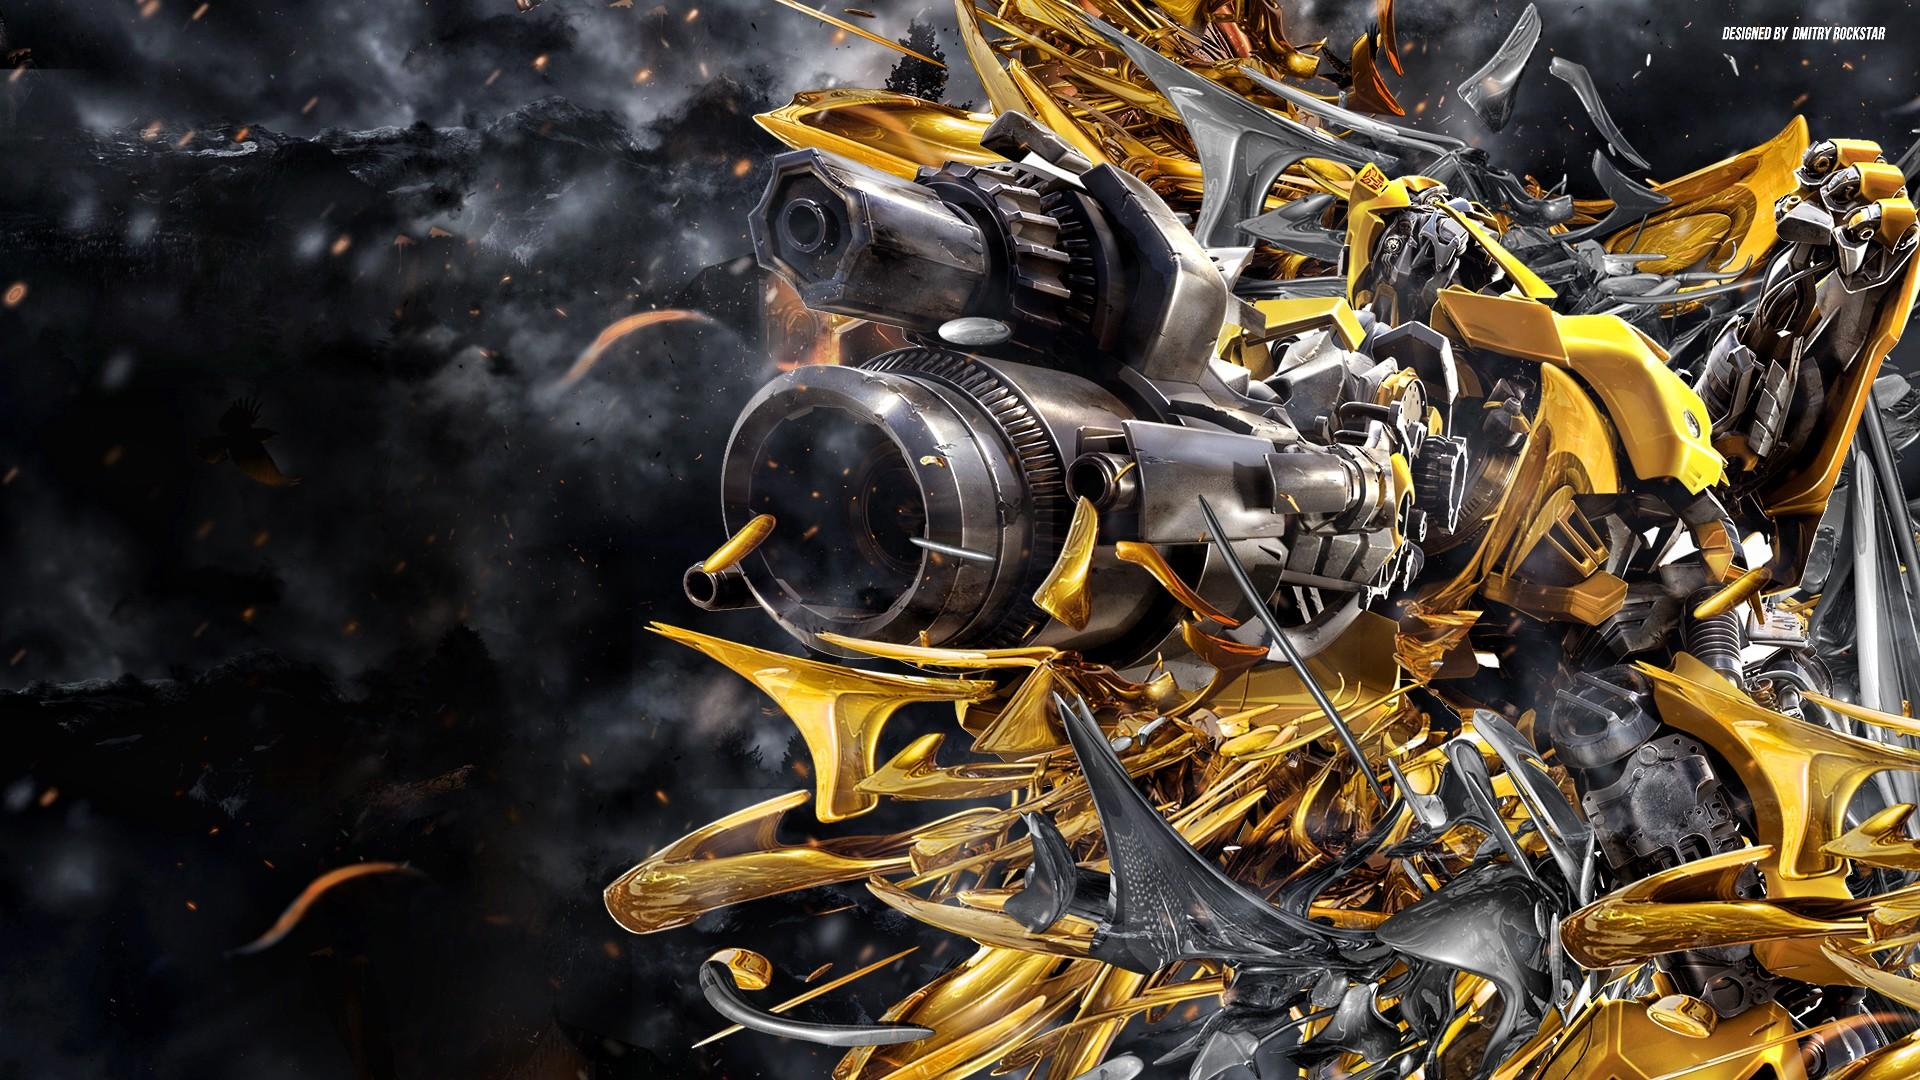 Transformers Bumblebee wallpaper   814591 1920x1080